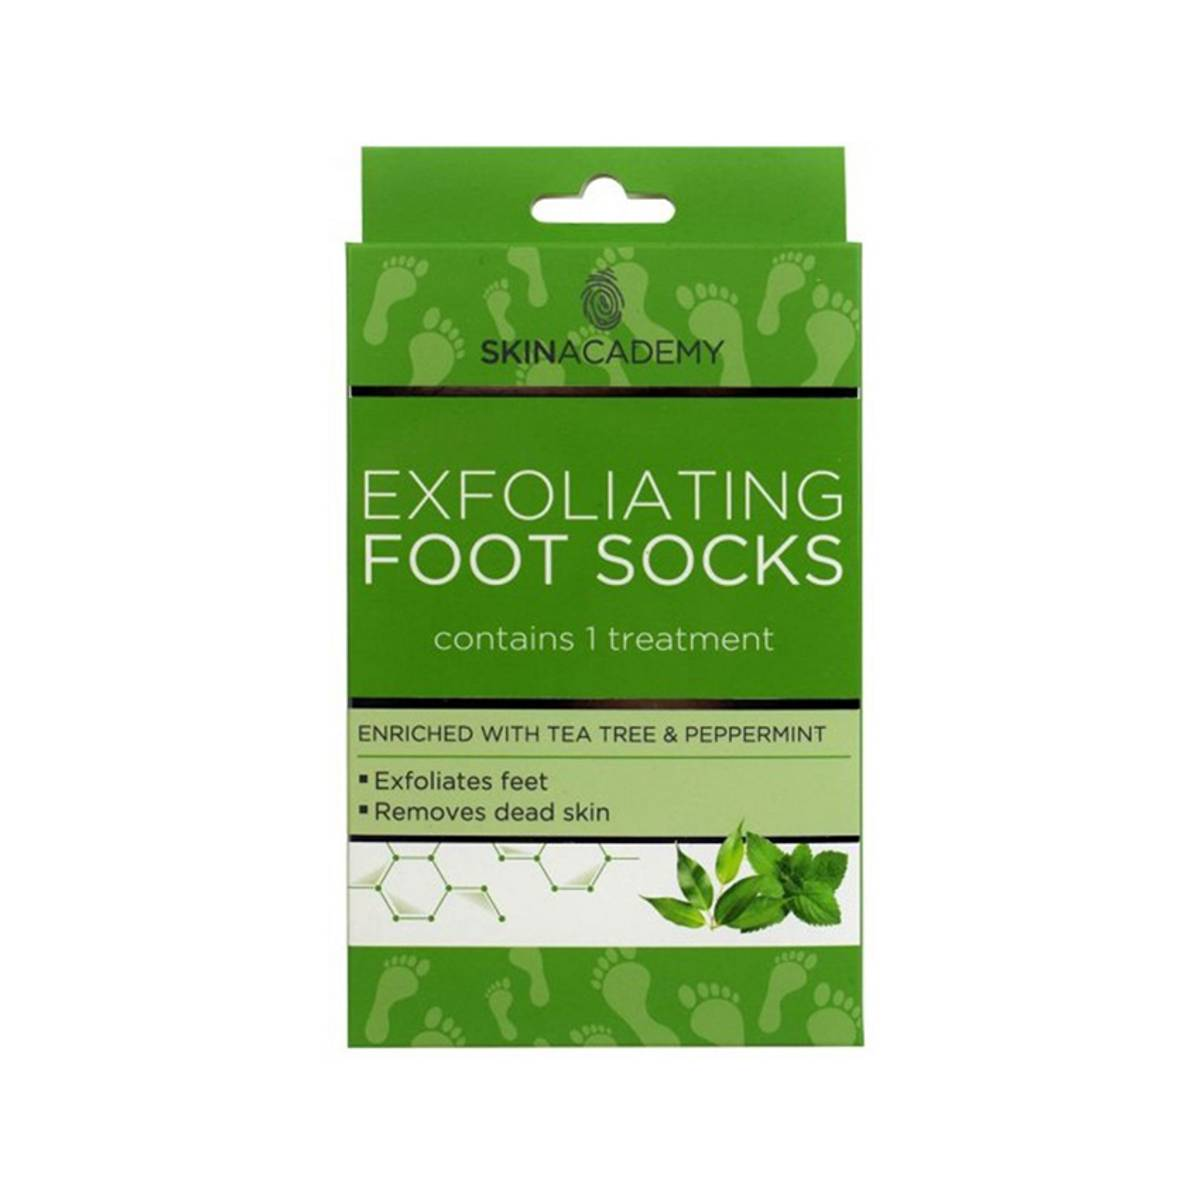 Exfoliating Foot Socks Tea Tree & Peppermint